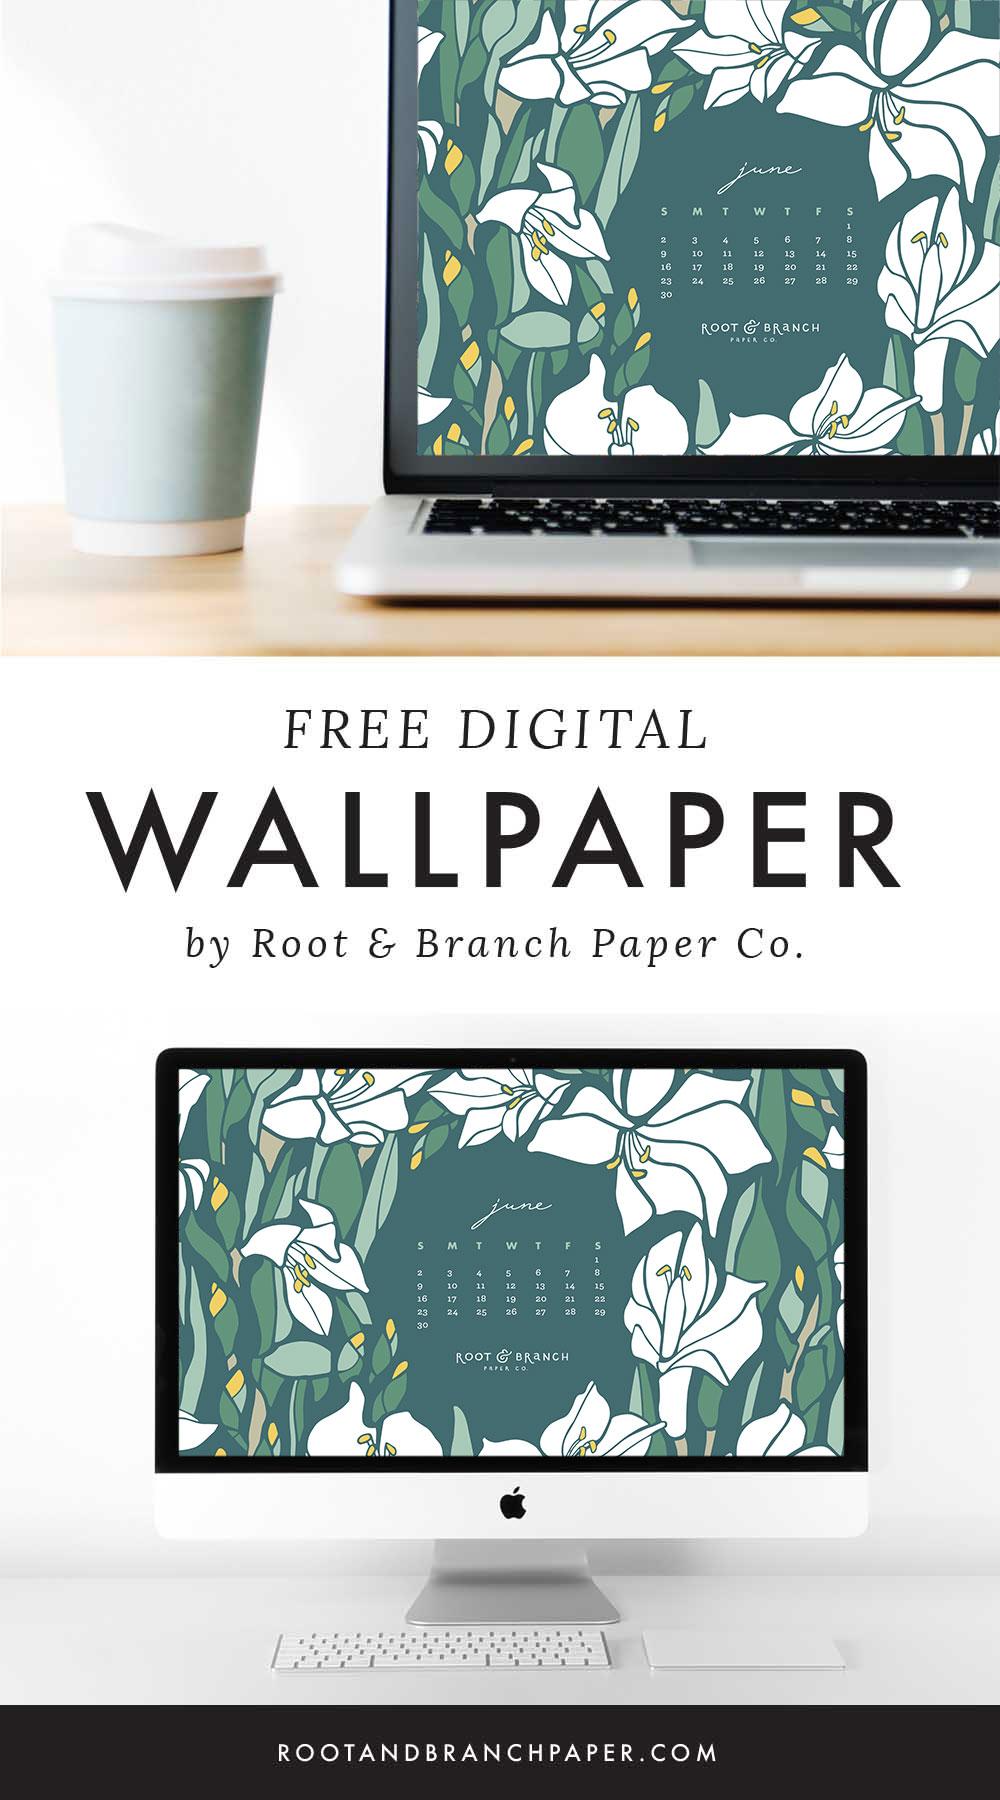 June 2019 Calendar Wallpaper, Free Digital Desktop Wallpaper, Illustrated Floral Desktop Calendar by Root & Branch Paper Co.